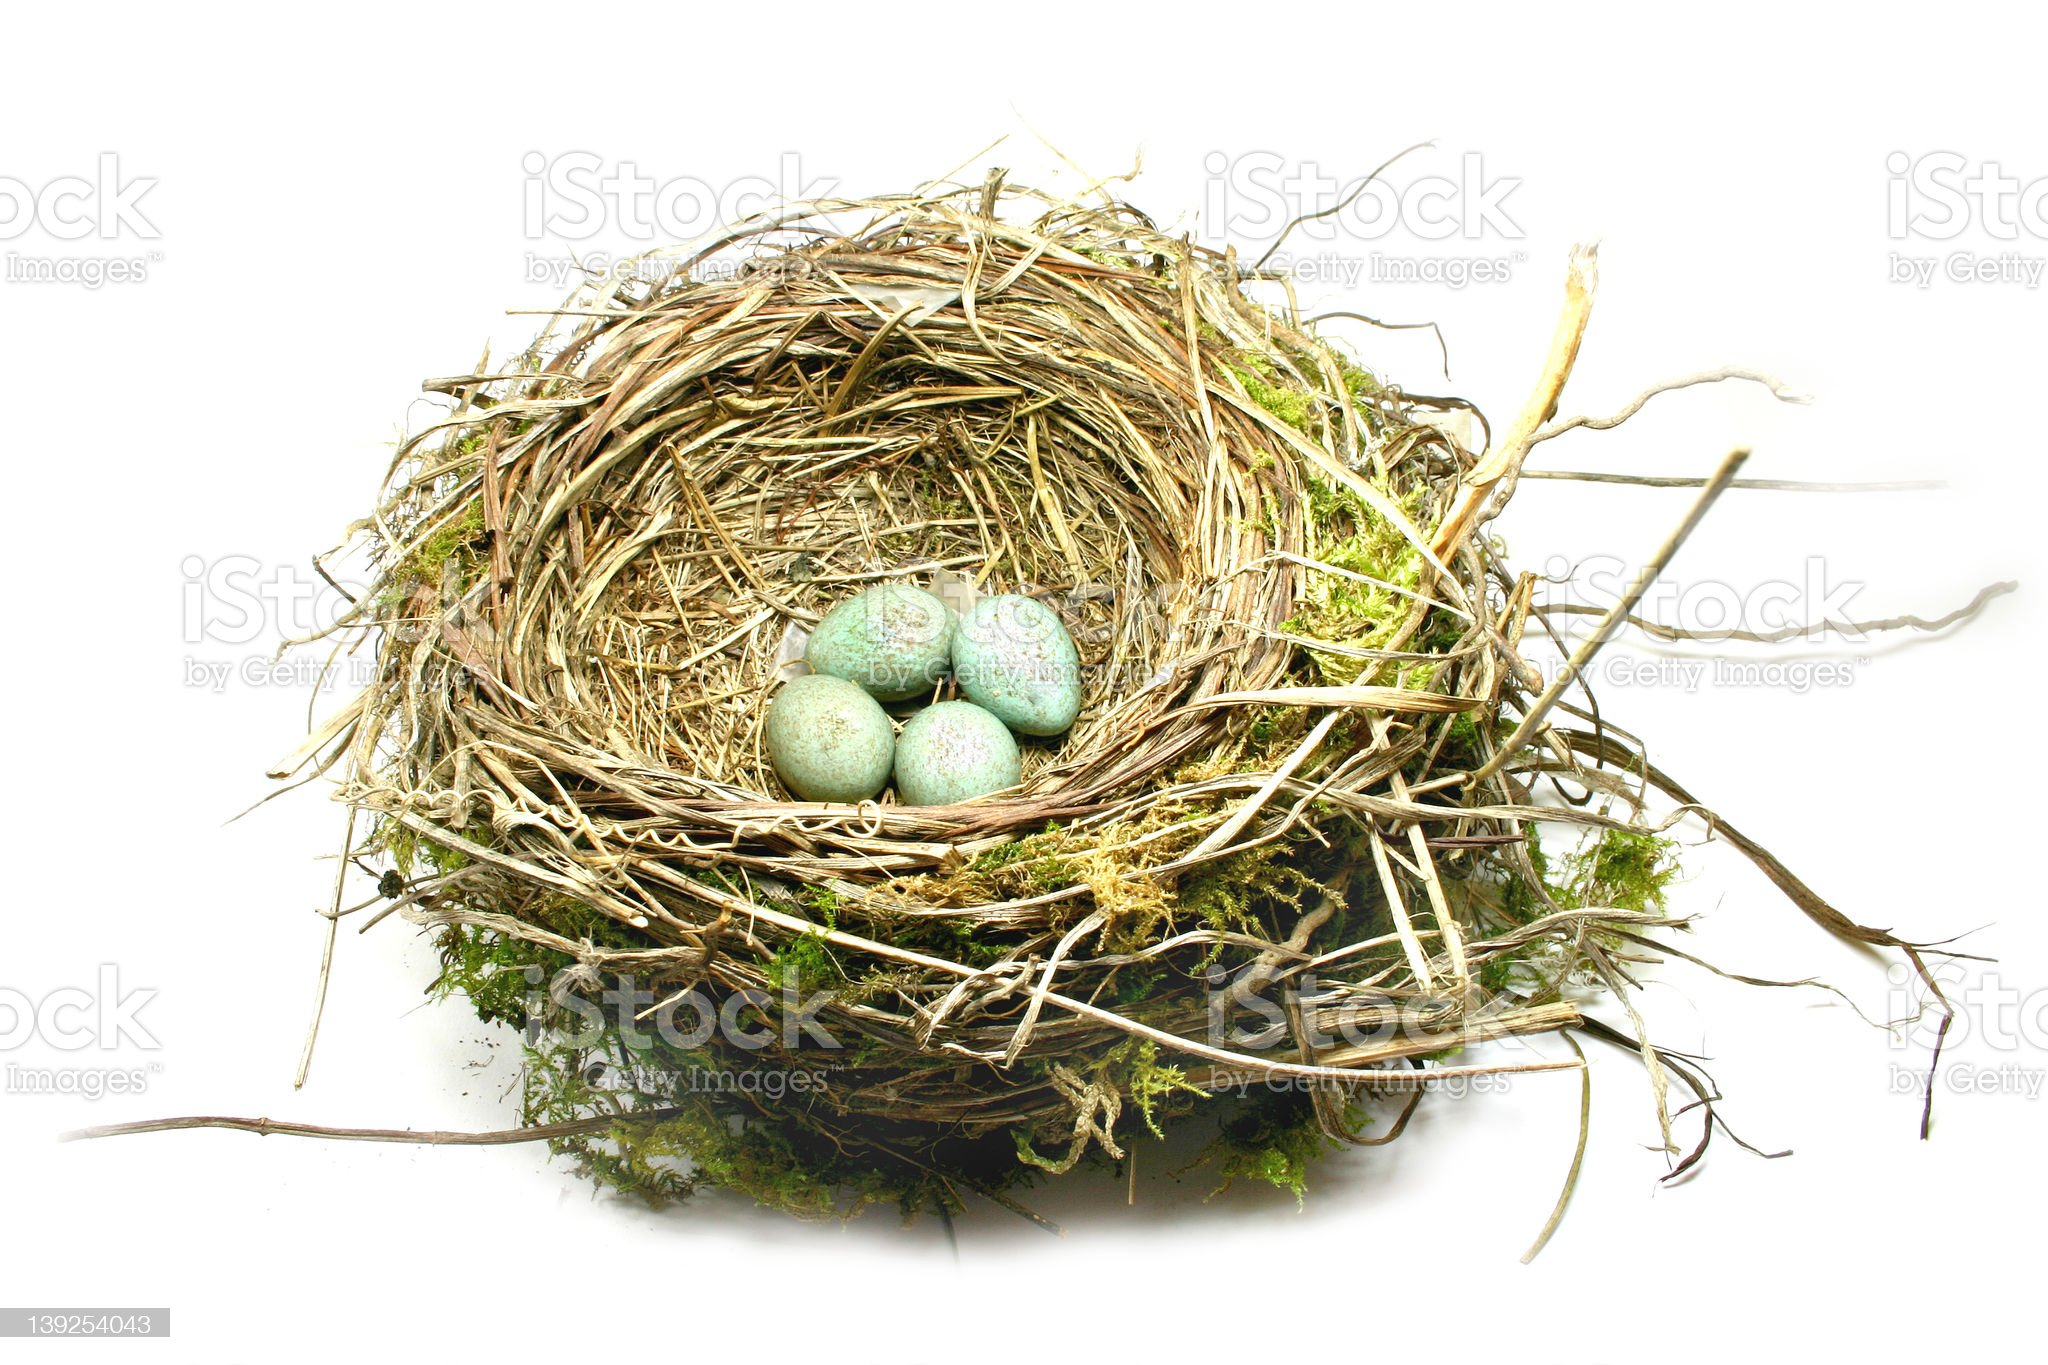 Nest royalty-free stock photo